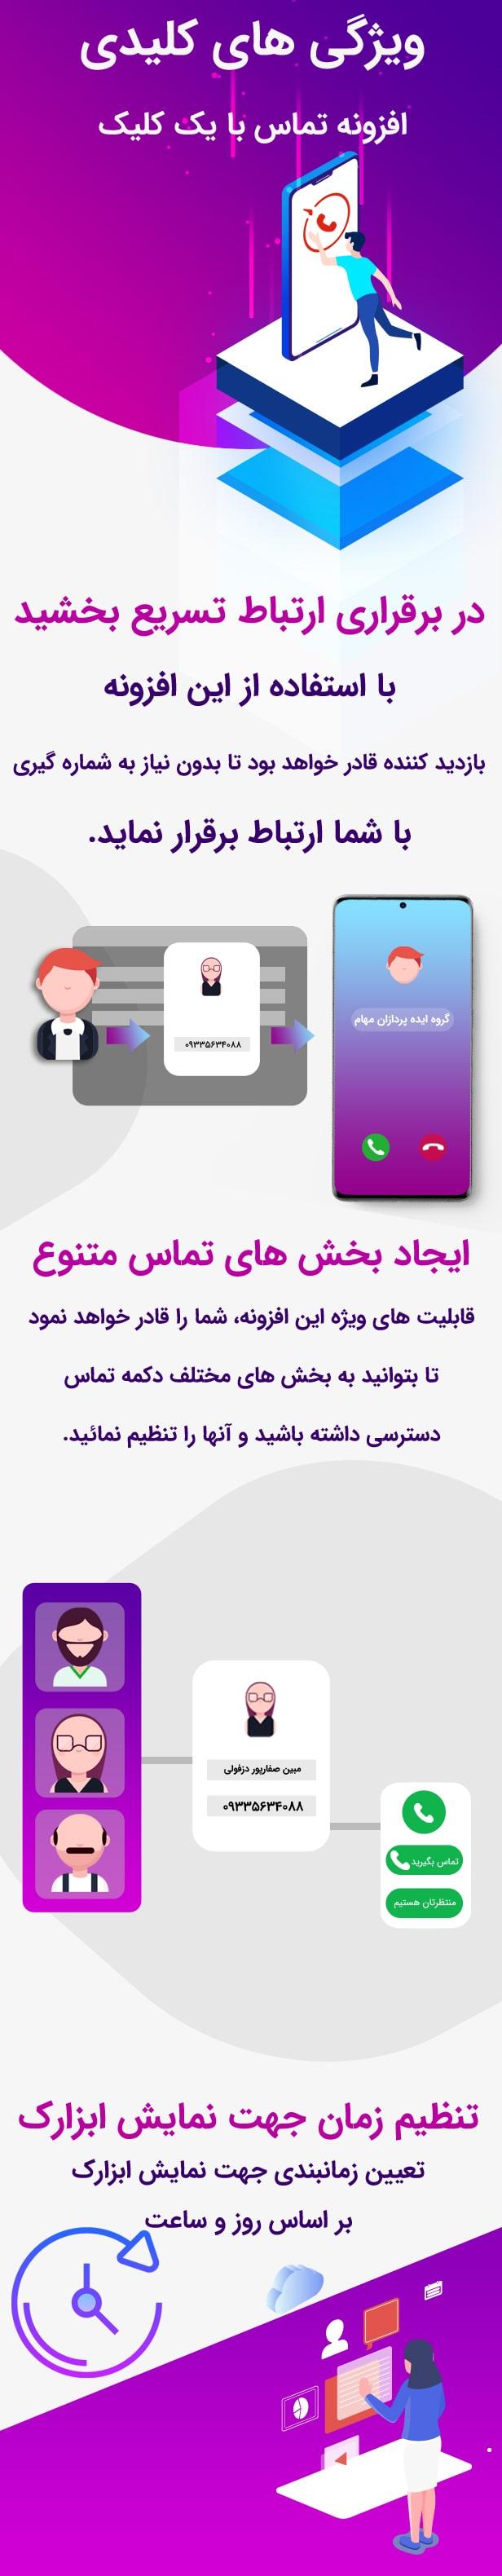 76518 33155ee7bd77ff6d4df47c3c6 - افزونه تماس تلفنی Click To Call ، پلاگین Call Button plugin for WordPress